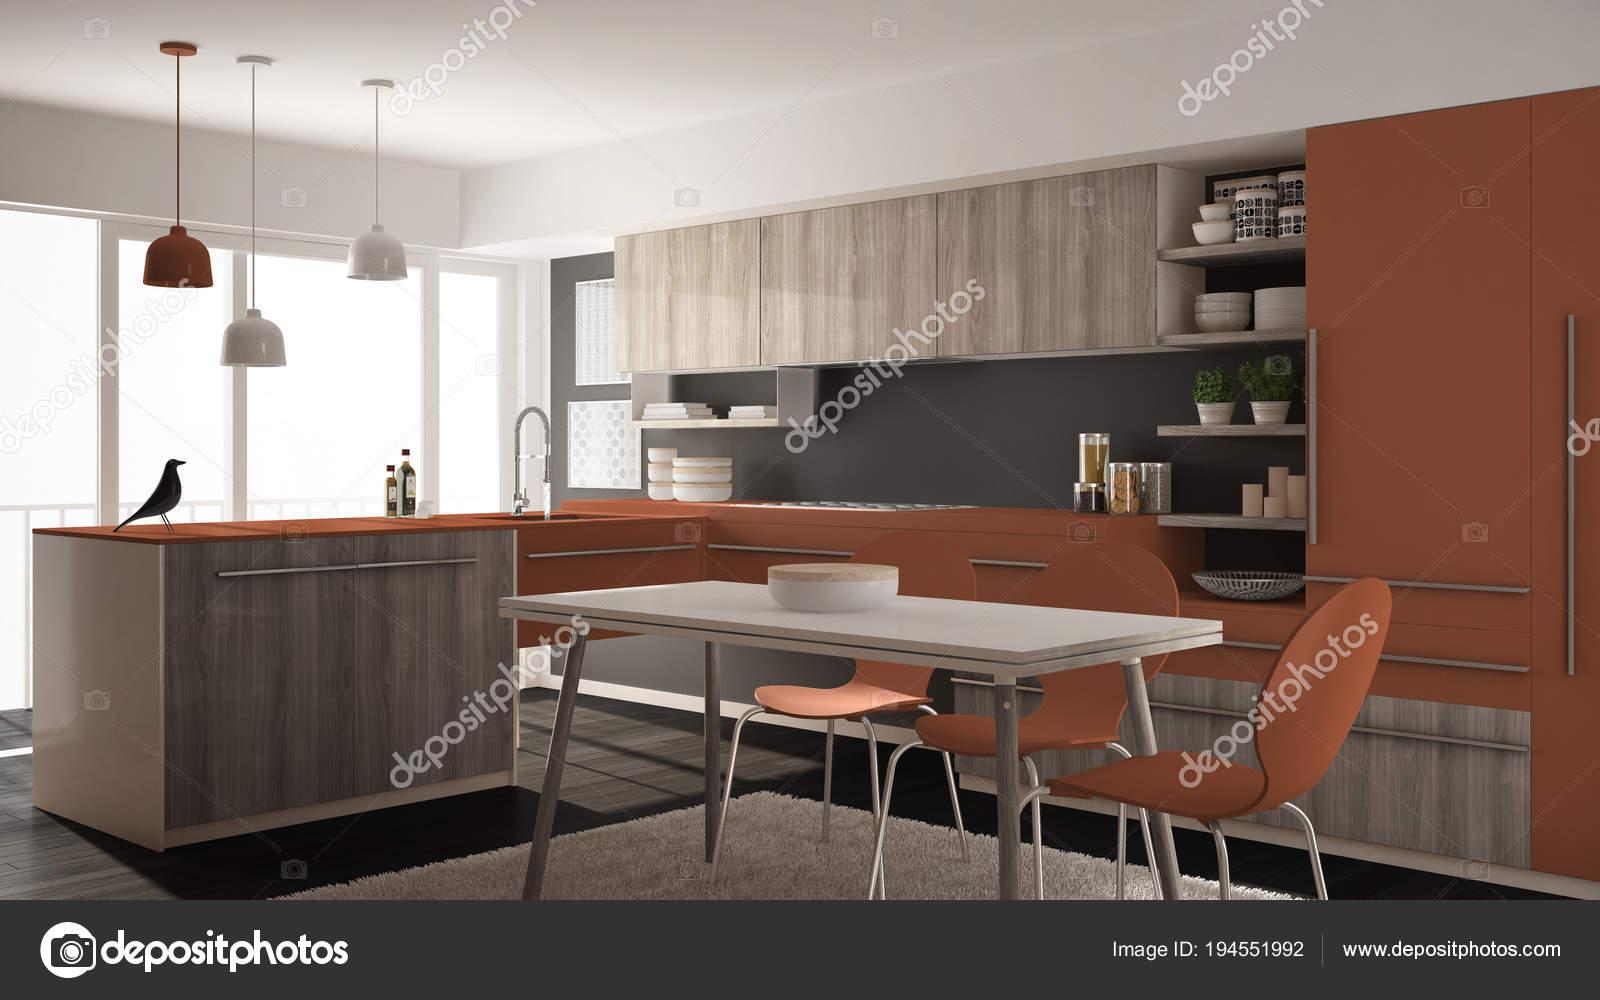 Cuisine en bois minimaliste moderne avec table à manger, tapis et ...